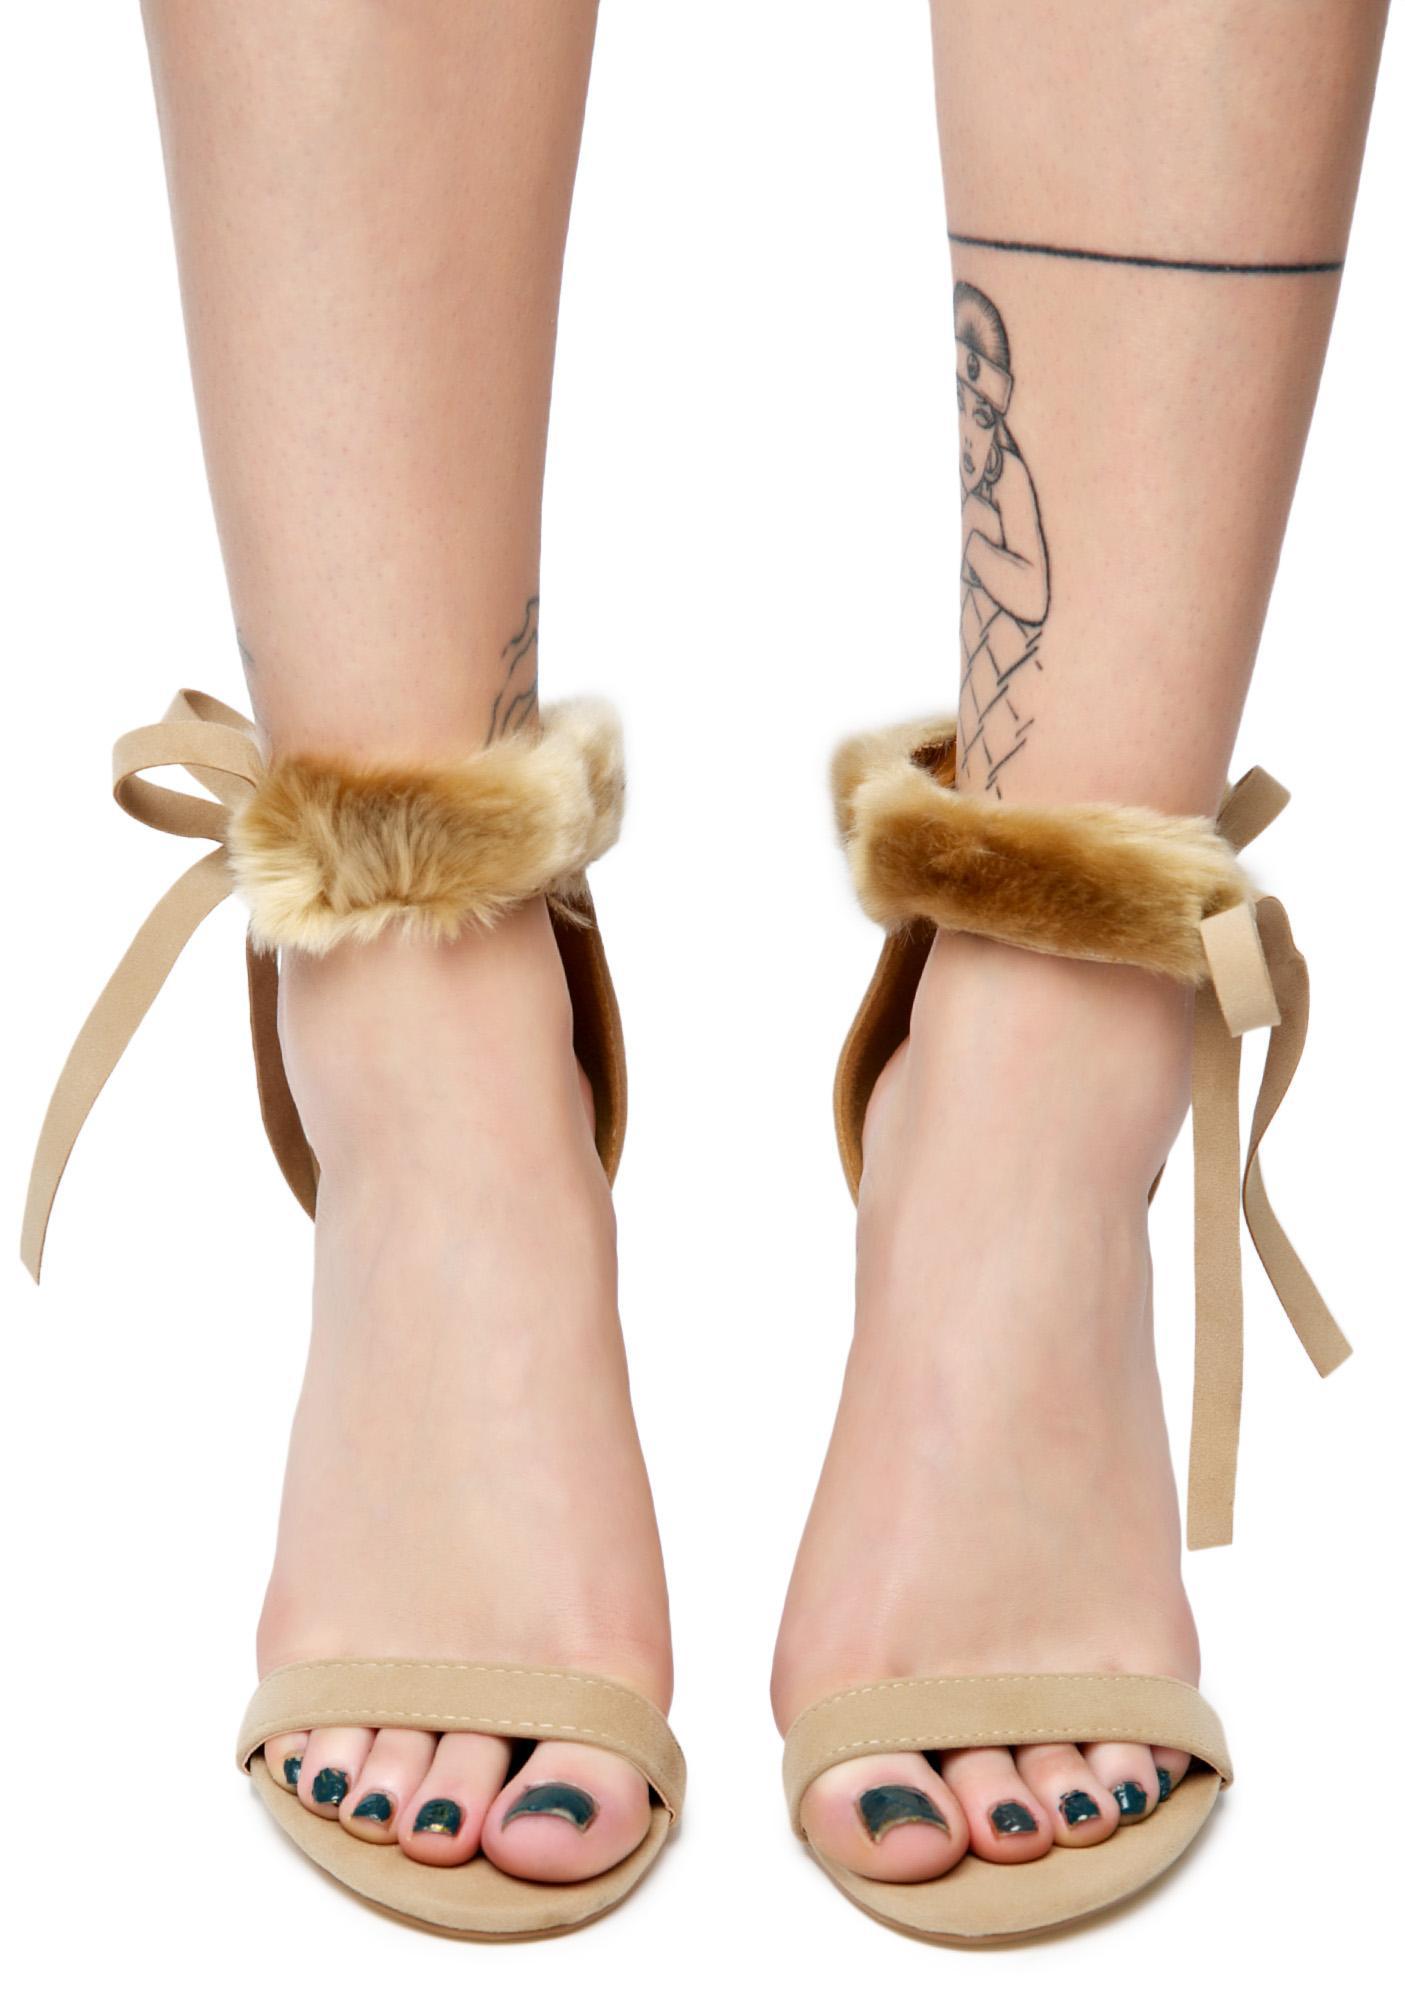 Ecru So Risqué Fuzzy Heels